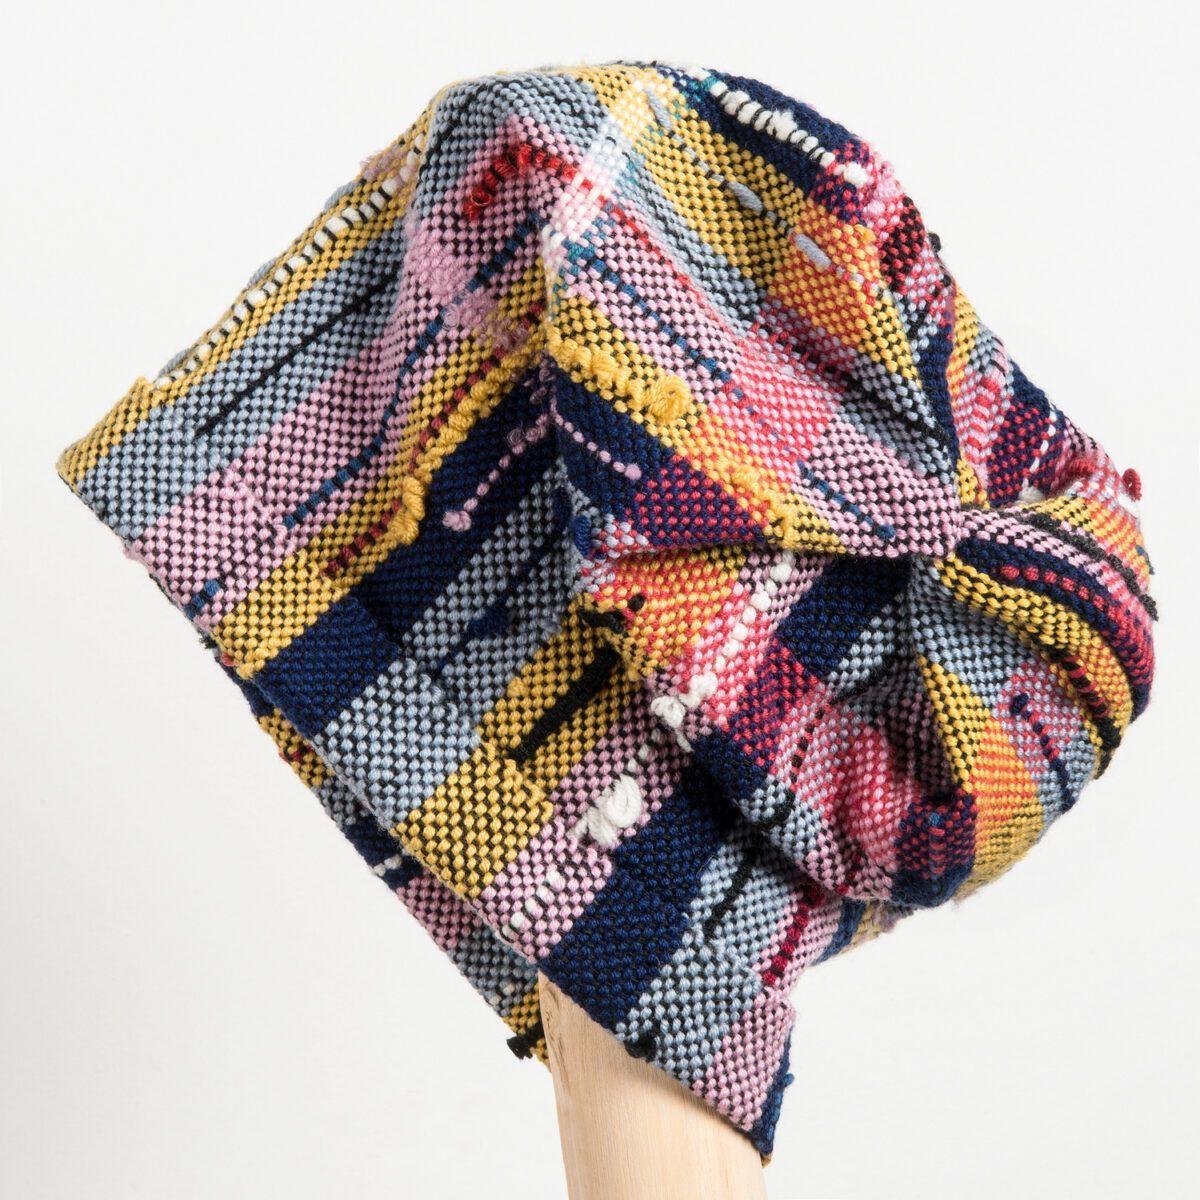 Contemporary weavings